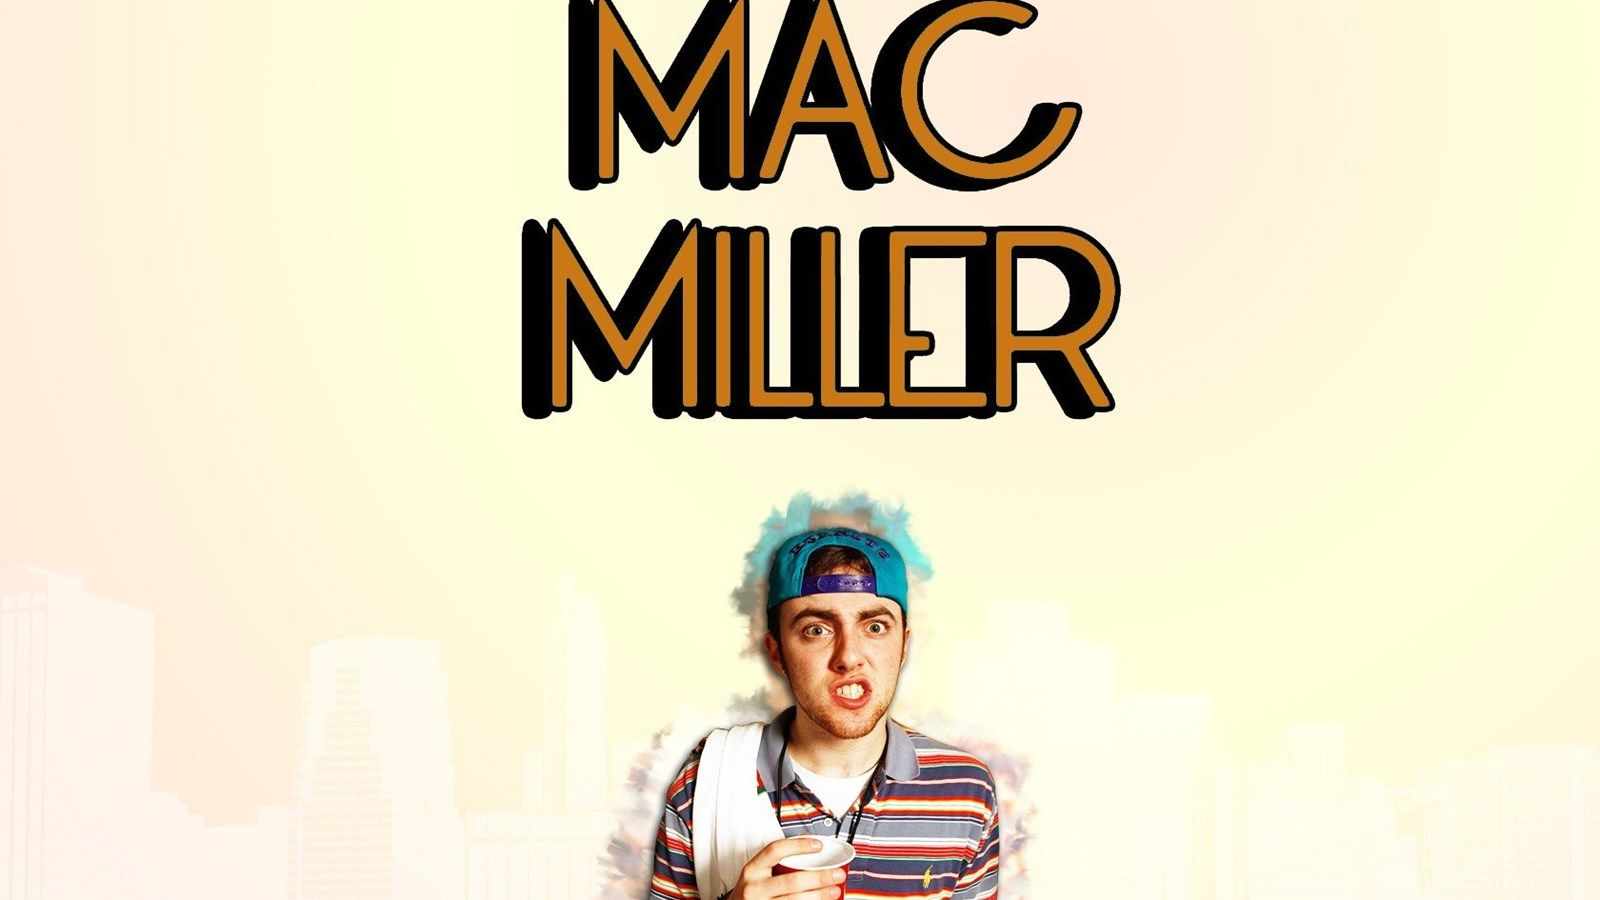 Mac Miller Wallpapers Top Free Mac Miller Backgrounds Wallpaperaccess